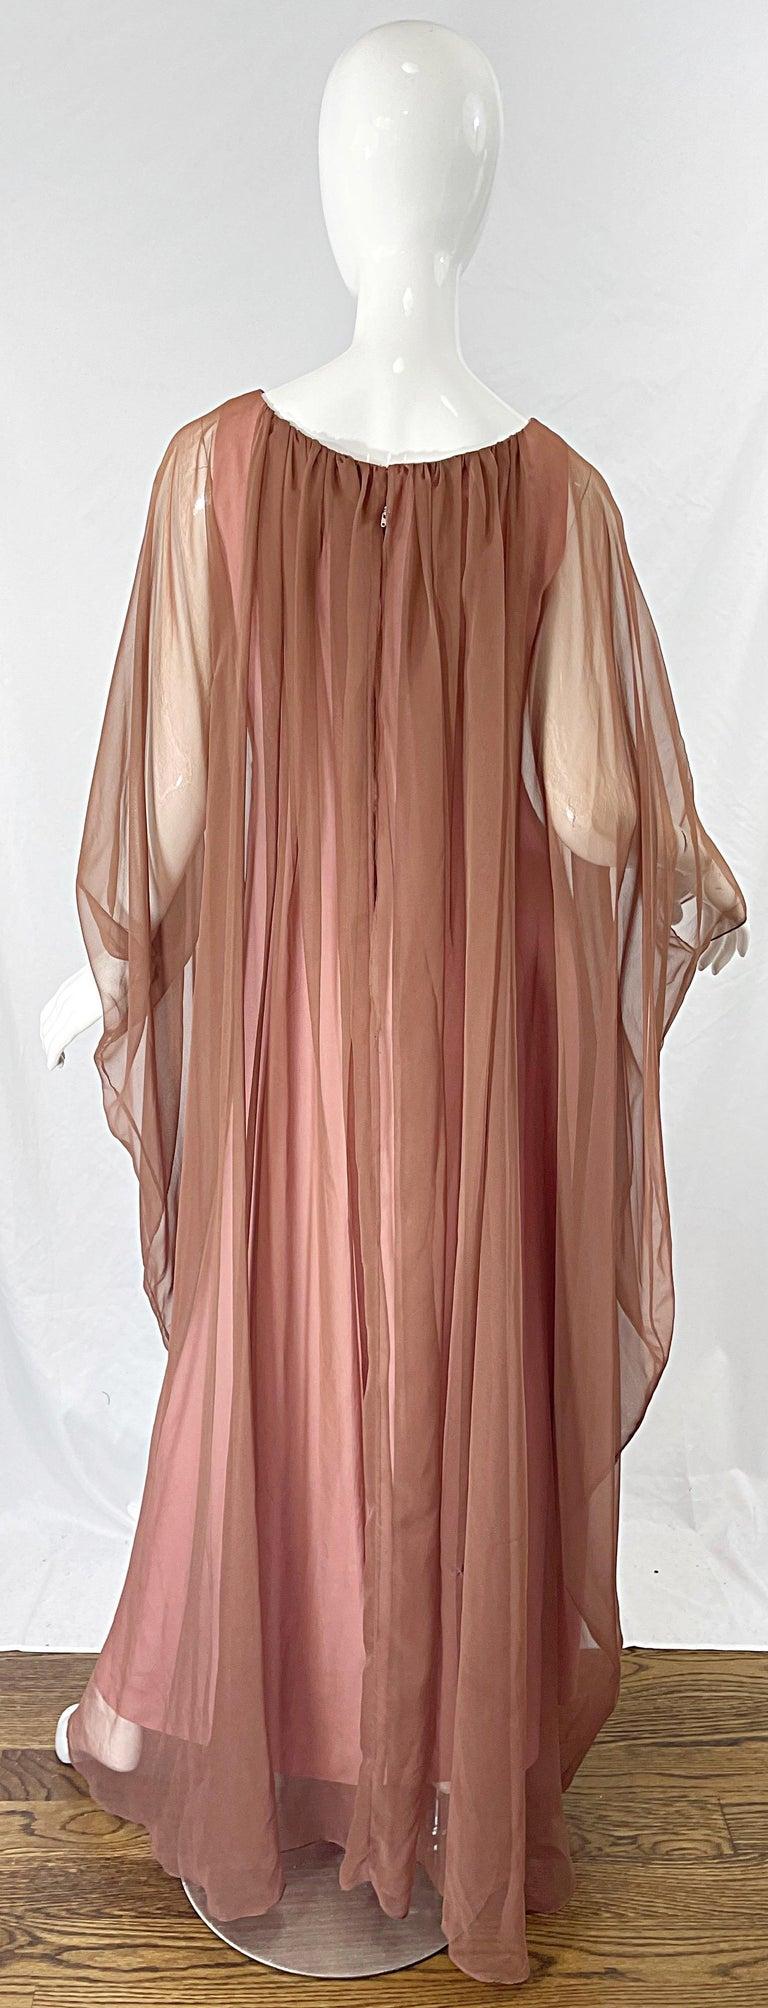 1970s Estevez Pink + Nude Brown Chiffon Caftan Vintage 70s Kaftan Maxi Dress For Sale 7